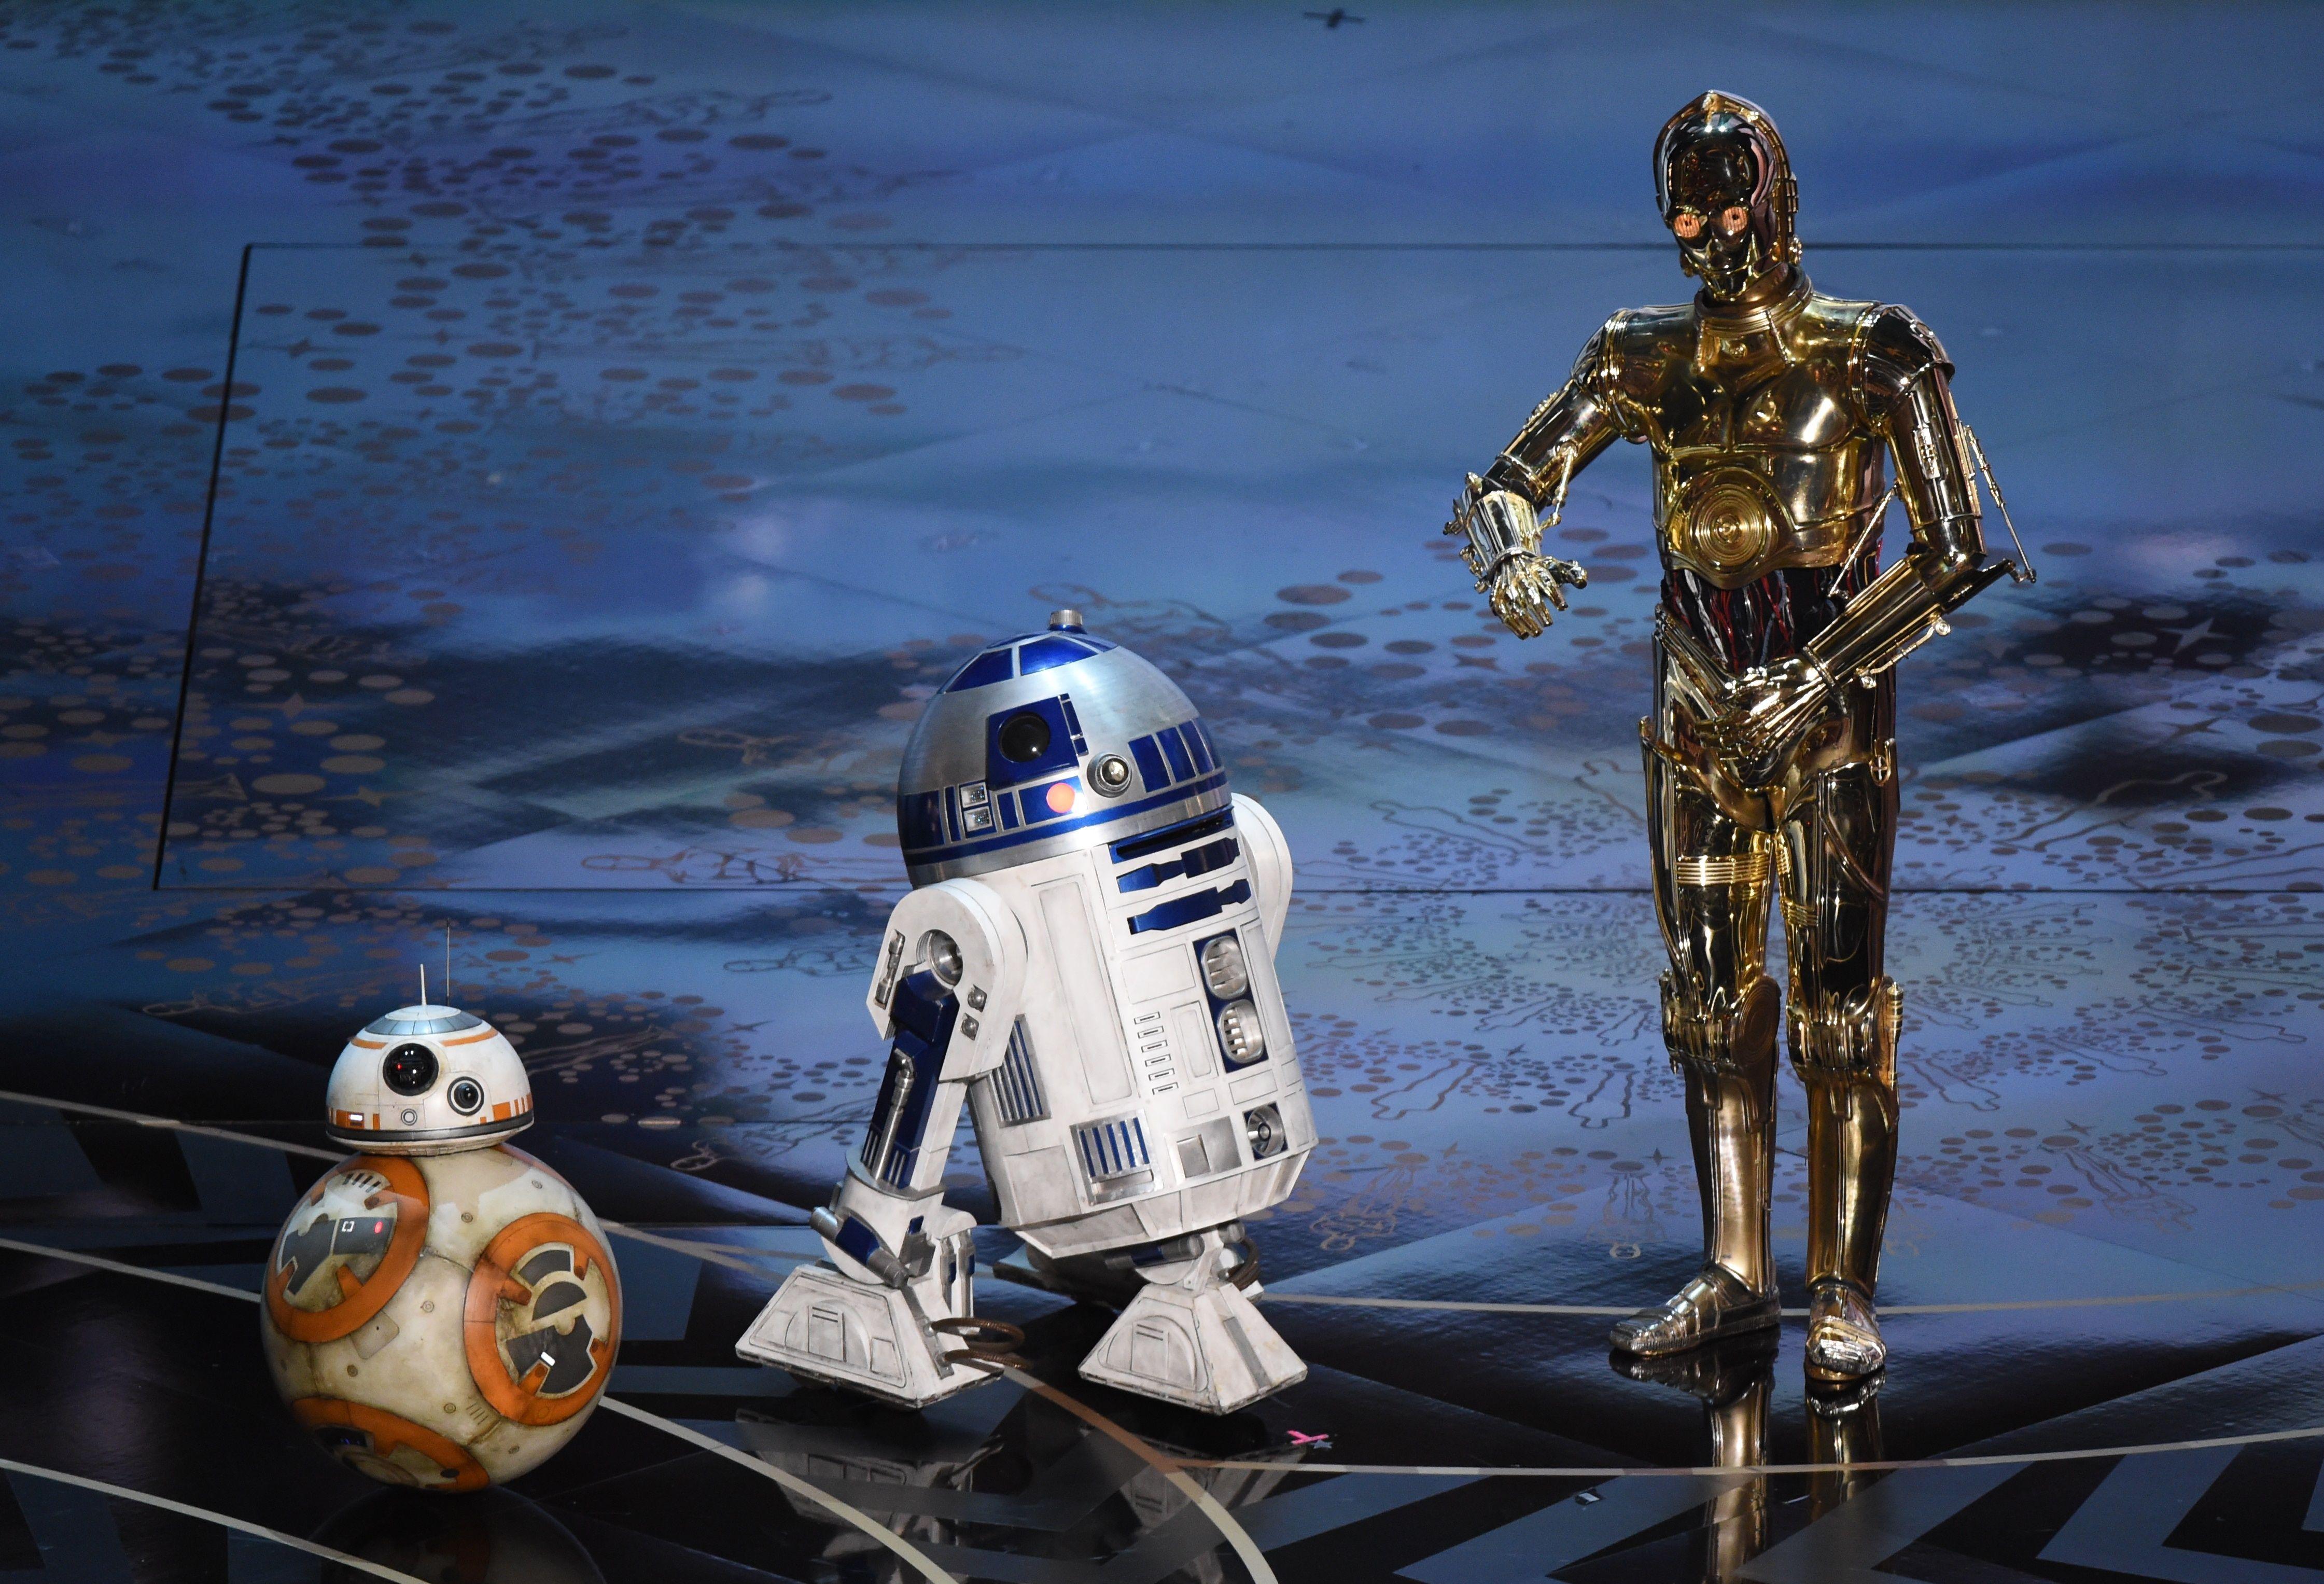 Legendary Star Wars cast member says goodbye as they wrap